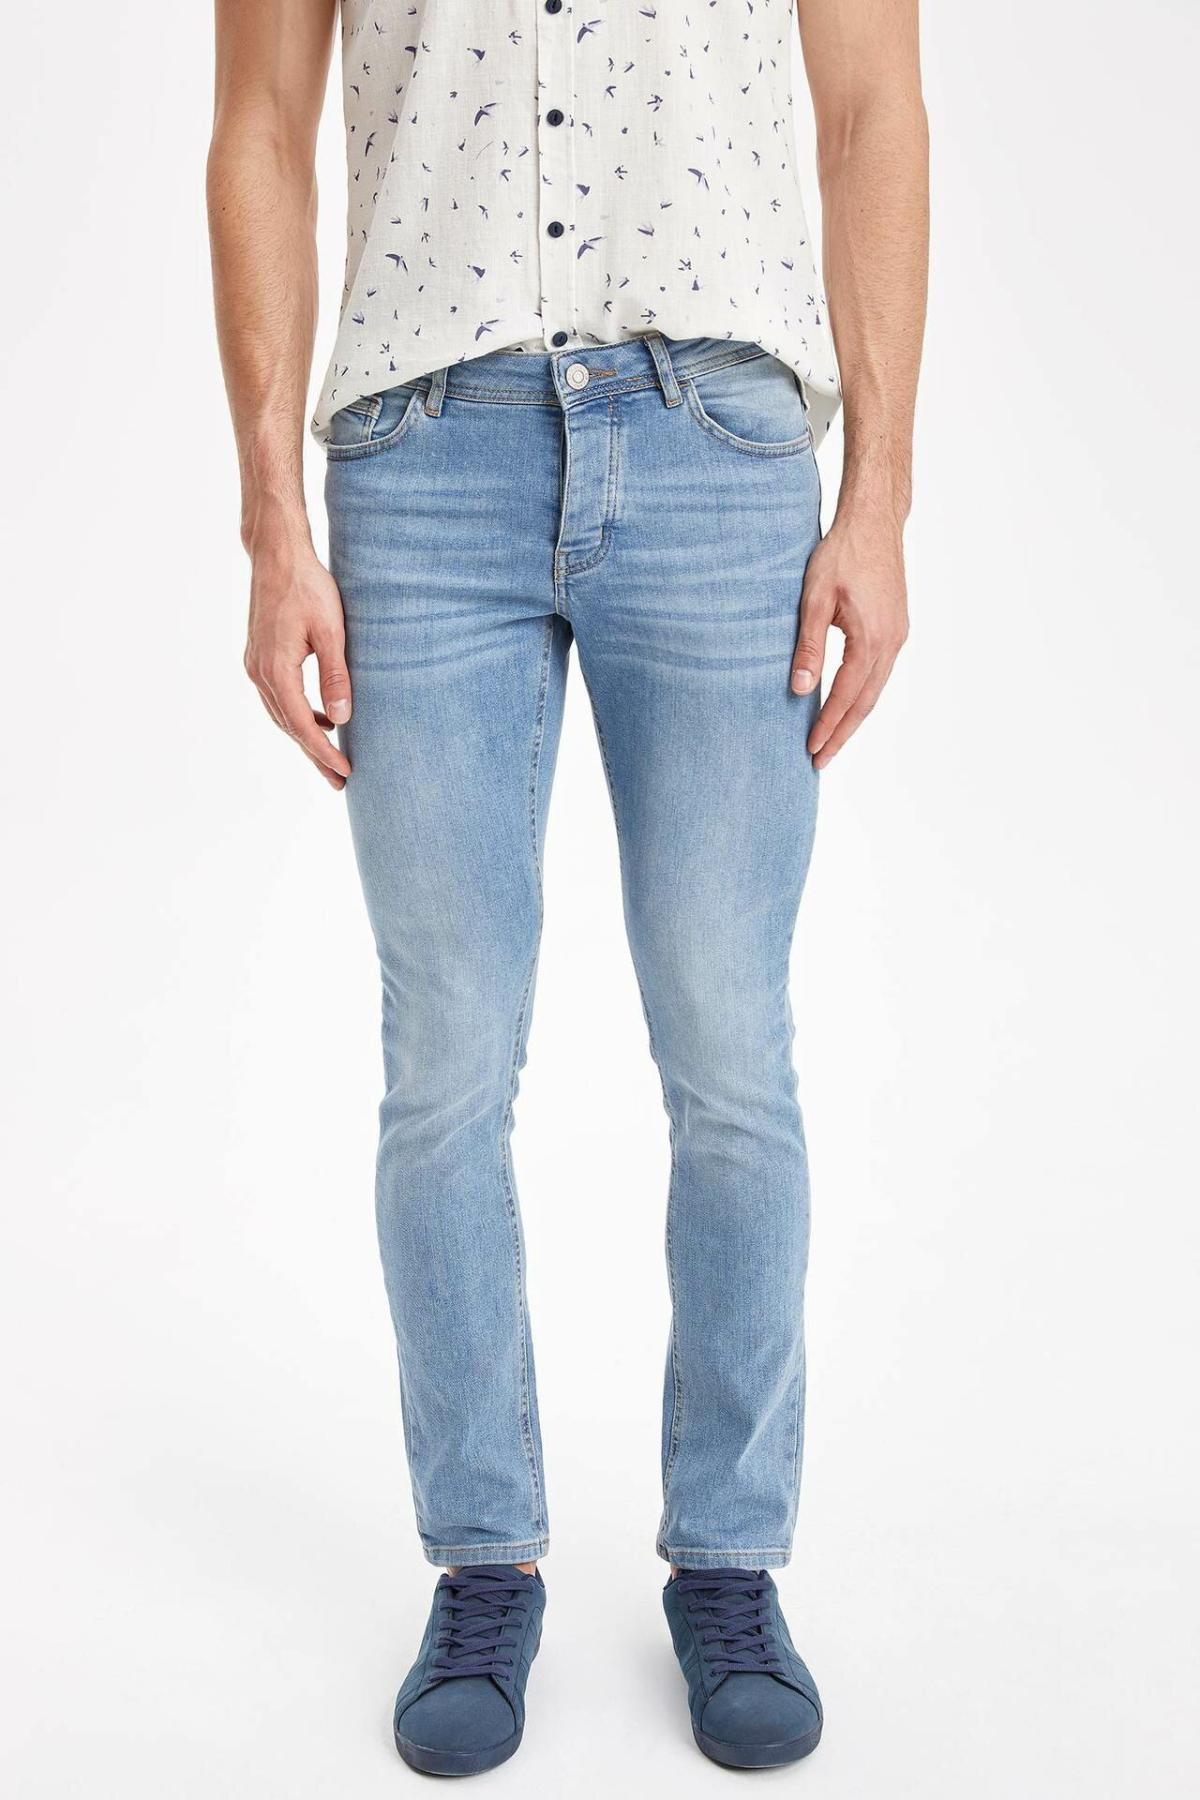 DeFacto Man Trousers-K4110AZ19SP